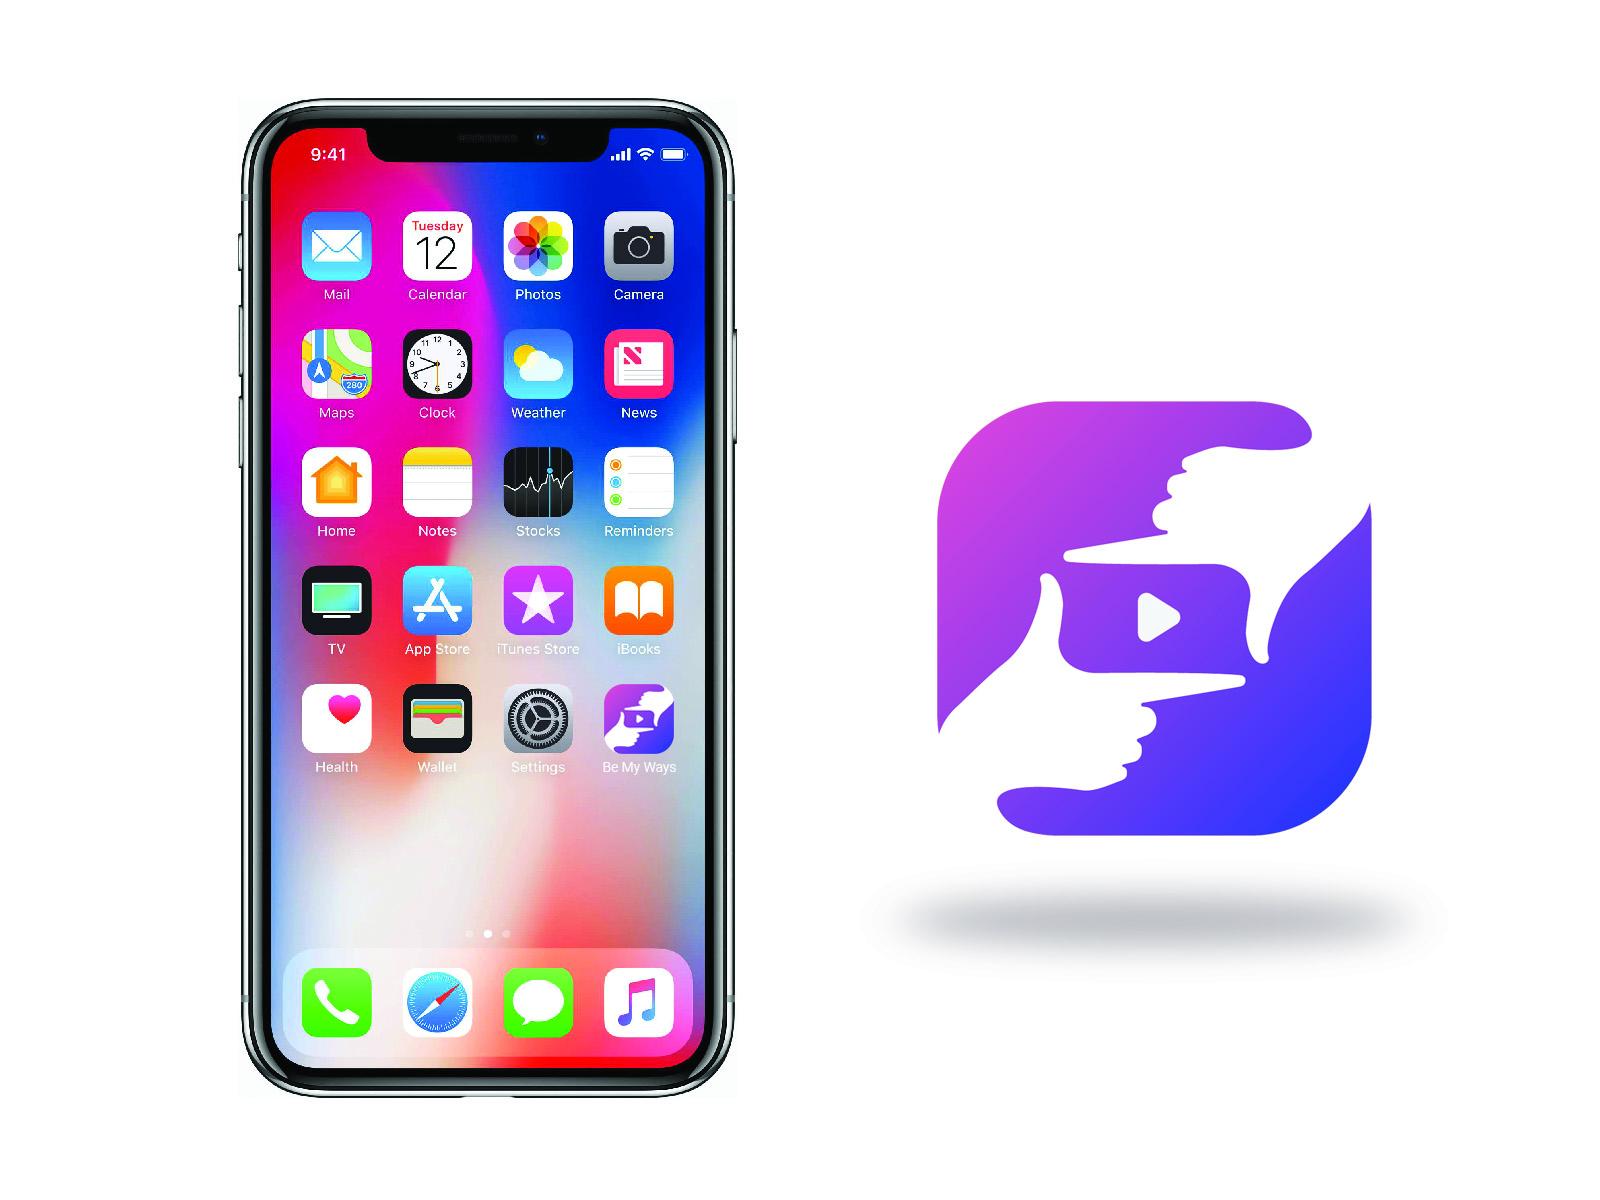 Разработка логотипа и иконки для Travel Video Platform фото f_8285c3e326b21d79.jpg